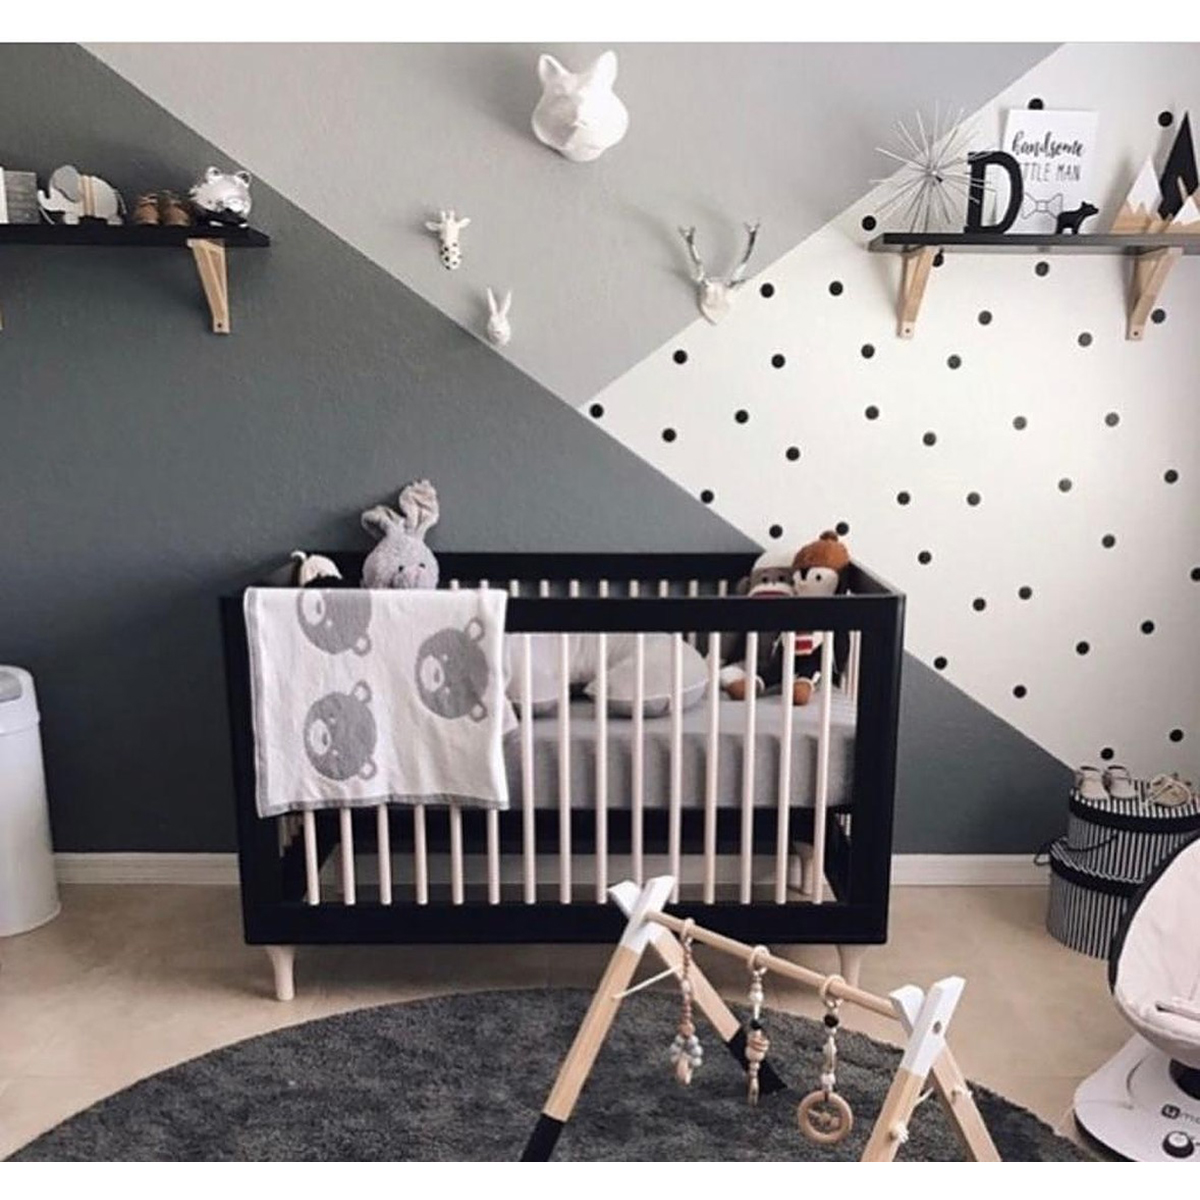 Patut bebe Home Concept, Negru imagine